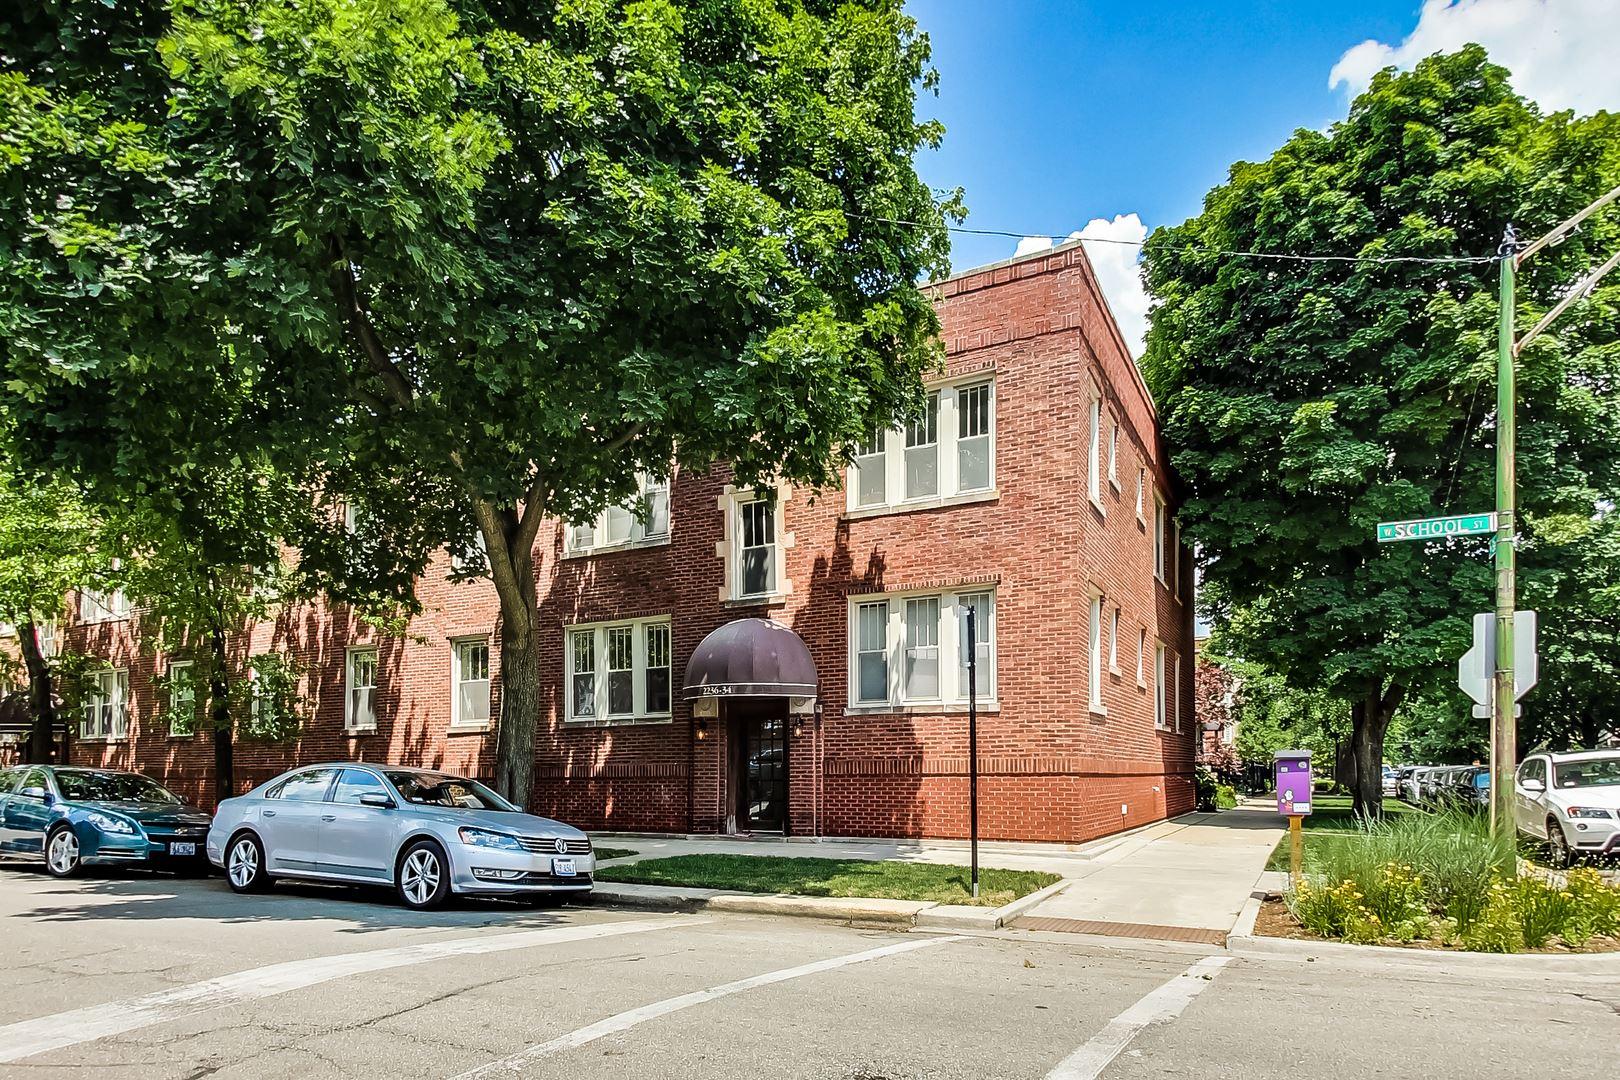 2236 W SCHOOL Street #1, Chicago, IL 60618 - #: 10779963